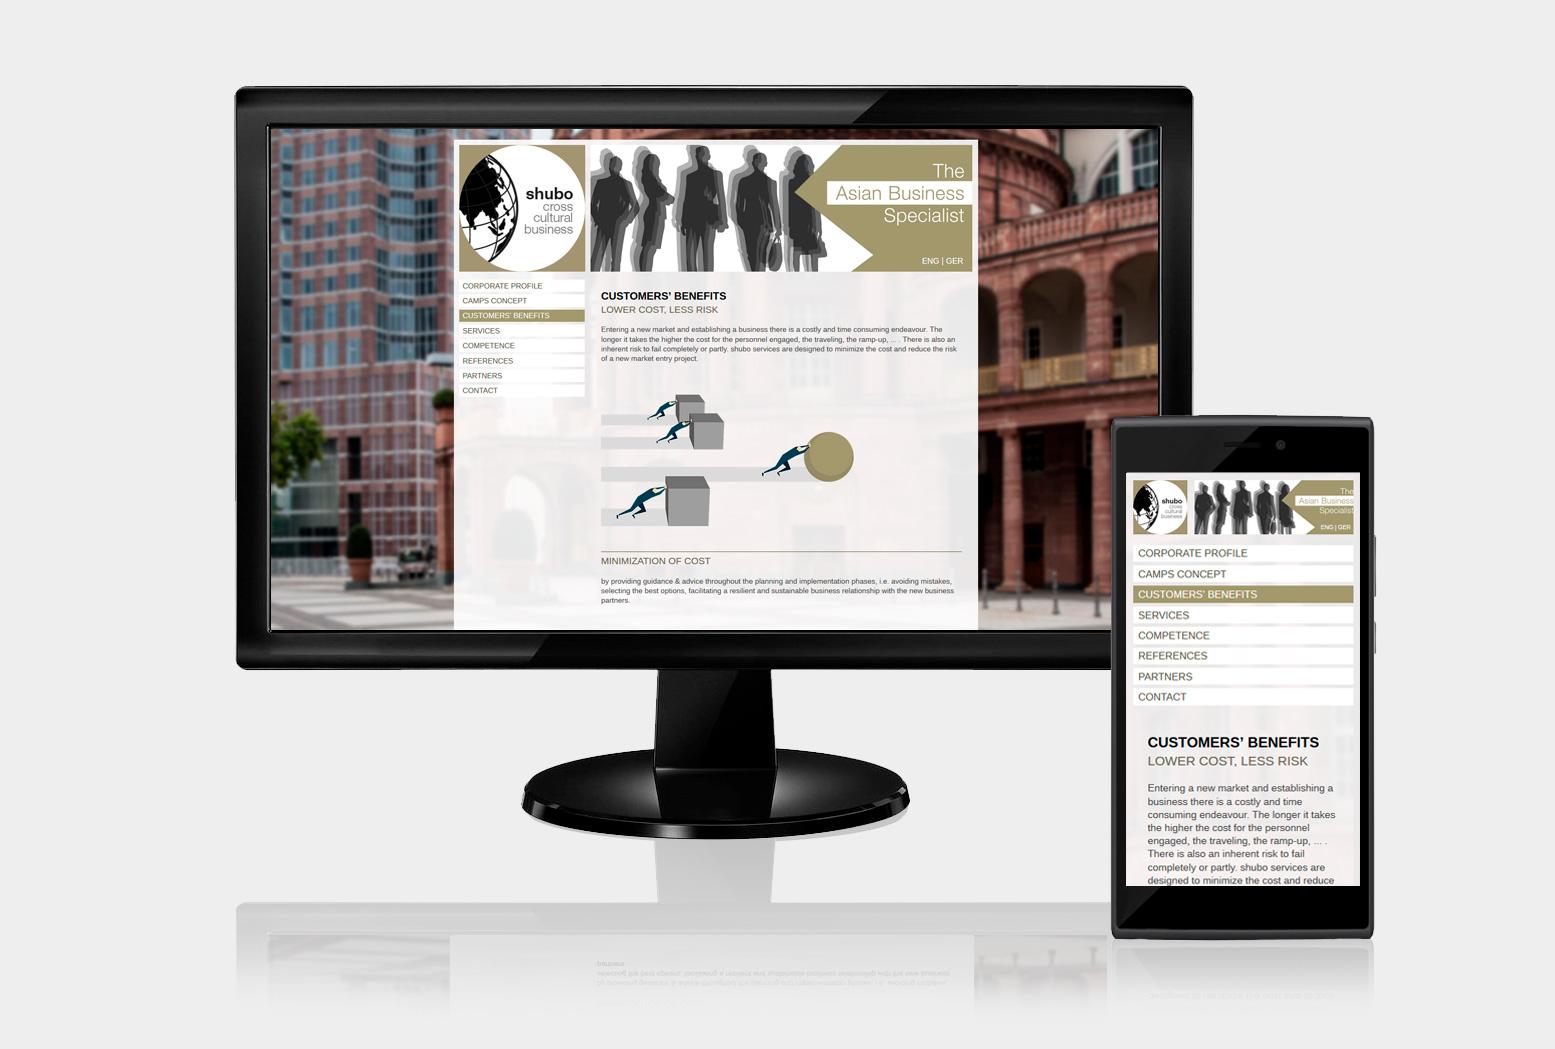 webdesign-05-shubo